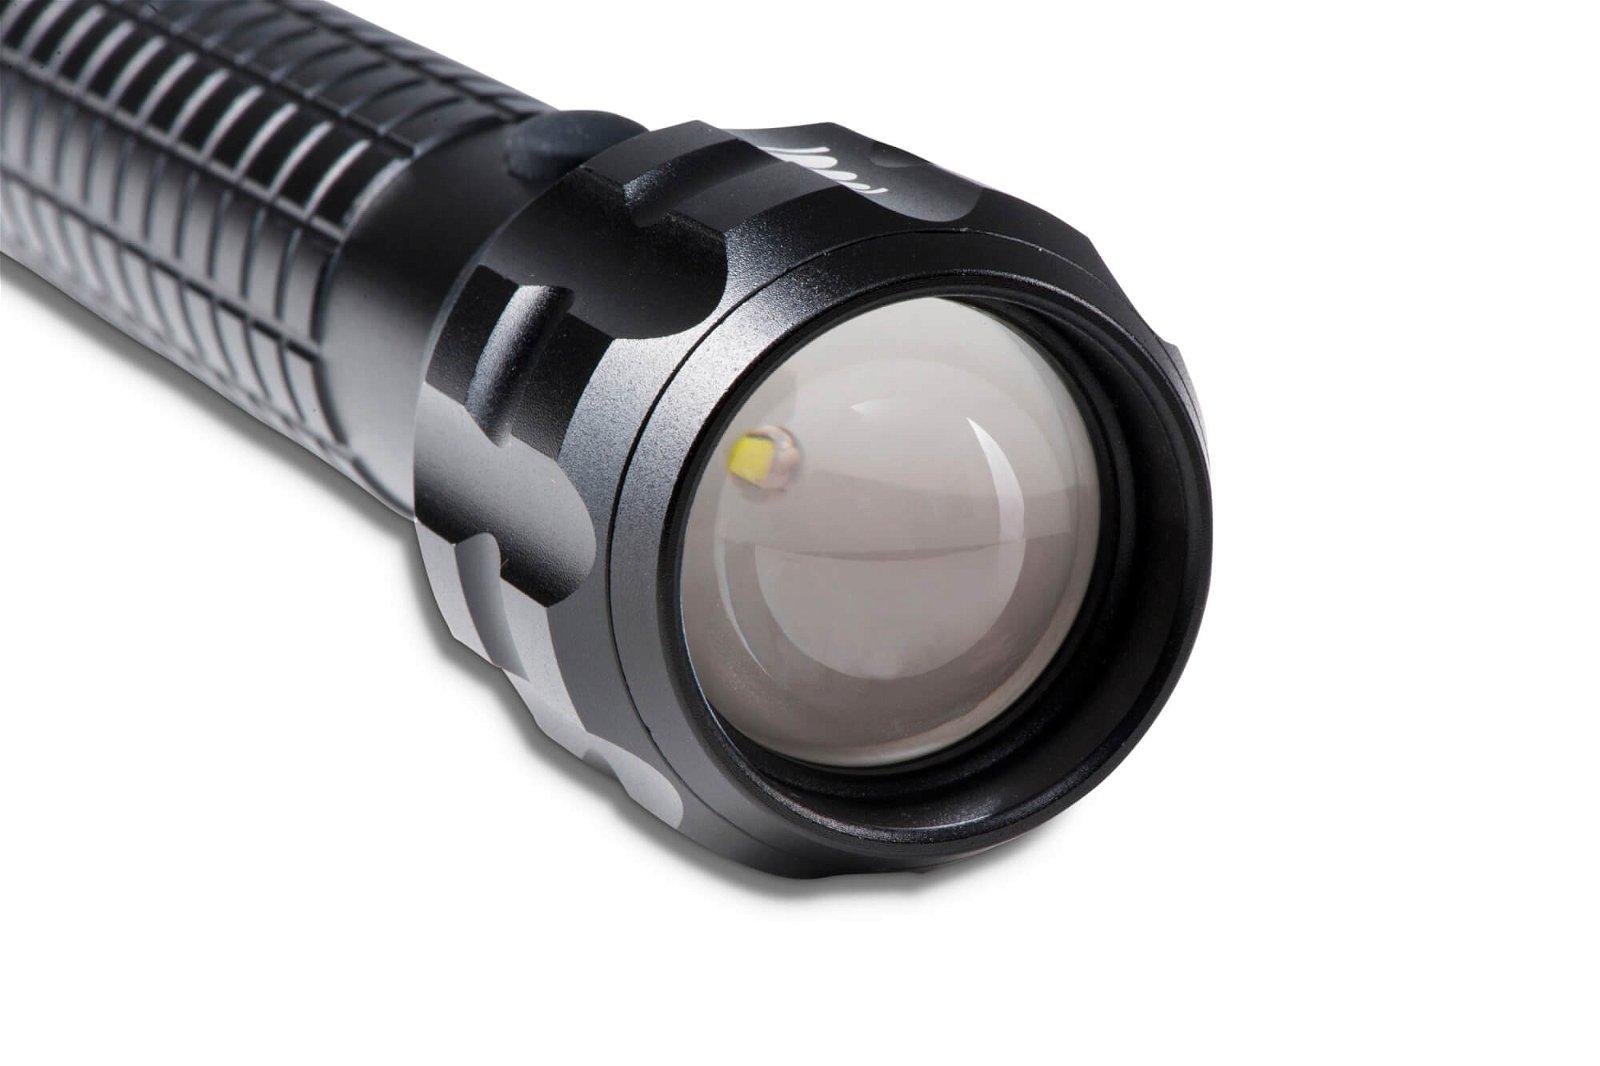 LED-Taschenlampe MAULkronos M